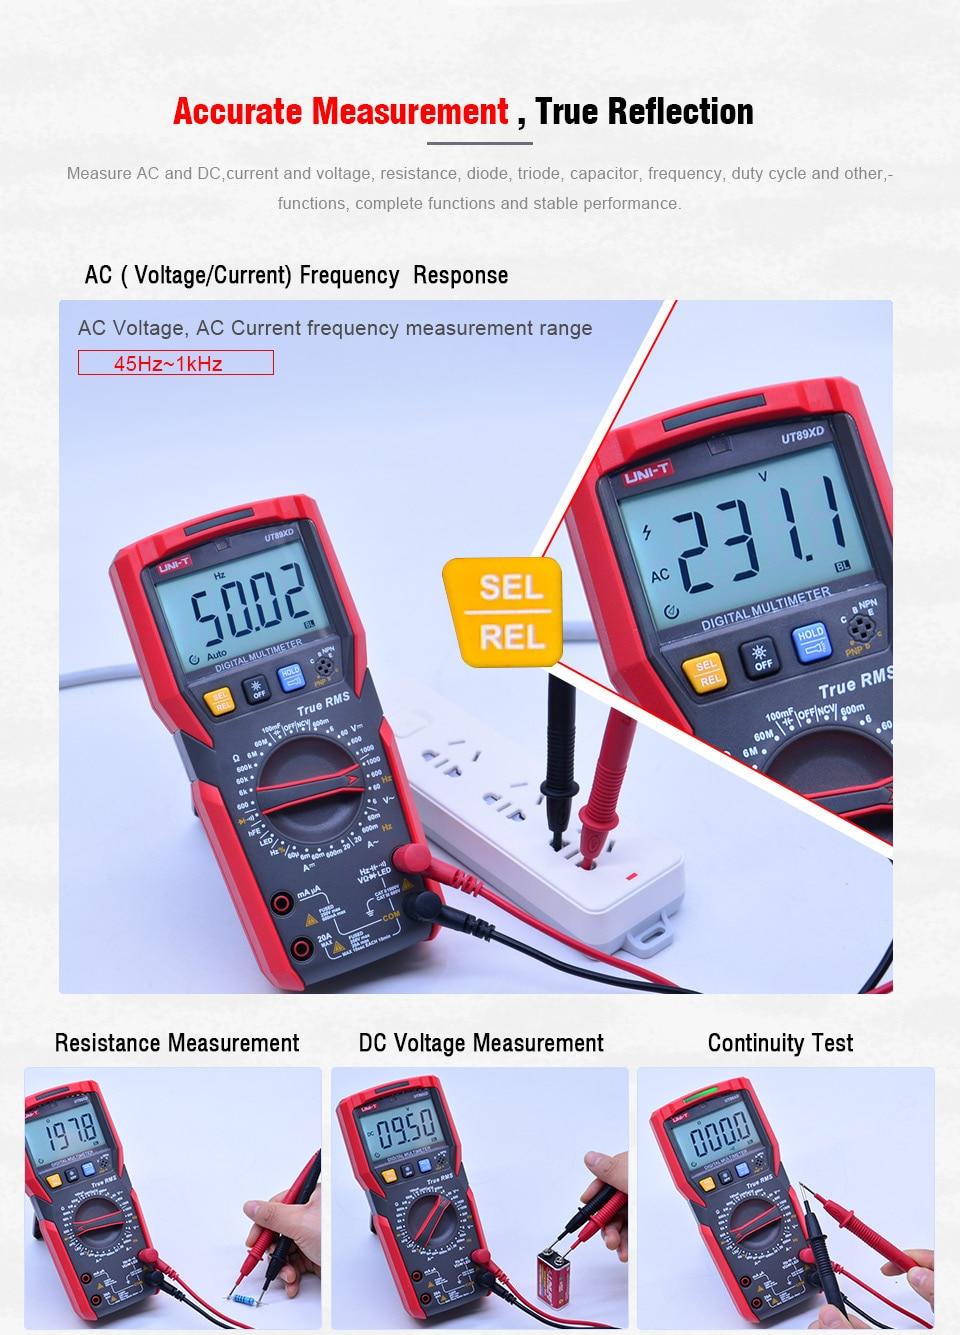 UNI-T ut89xd trms multímetro digital tester ac